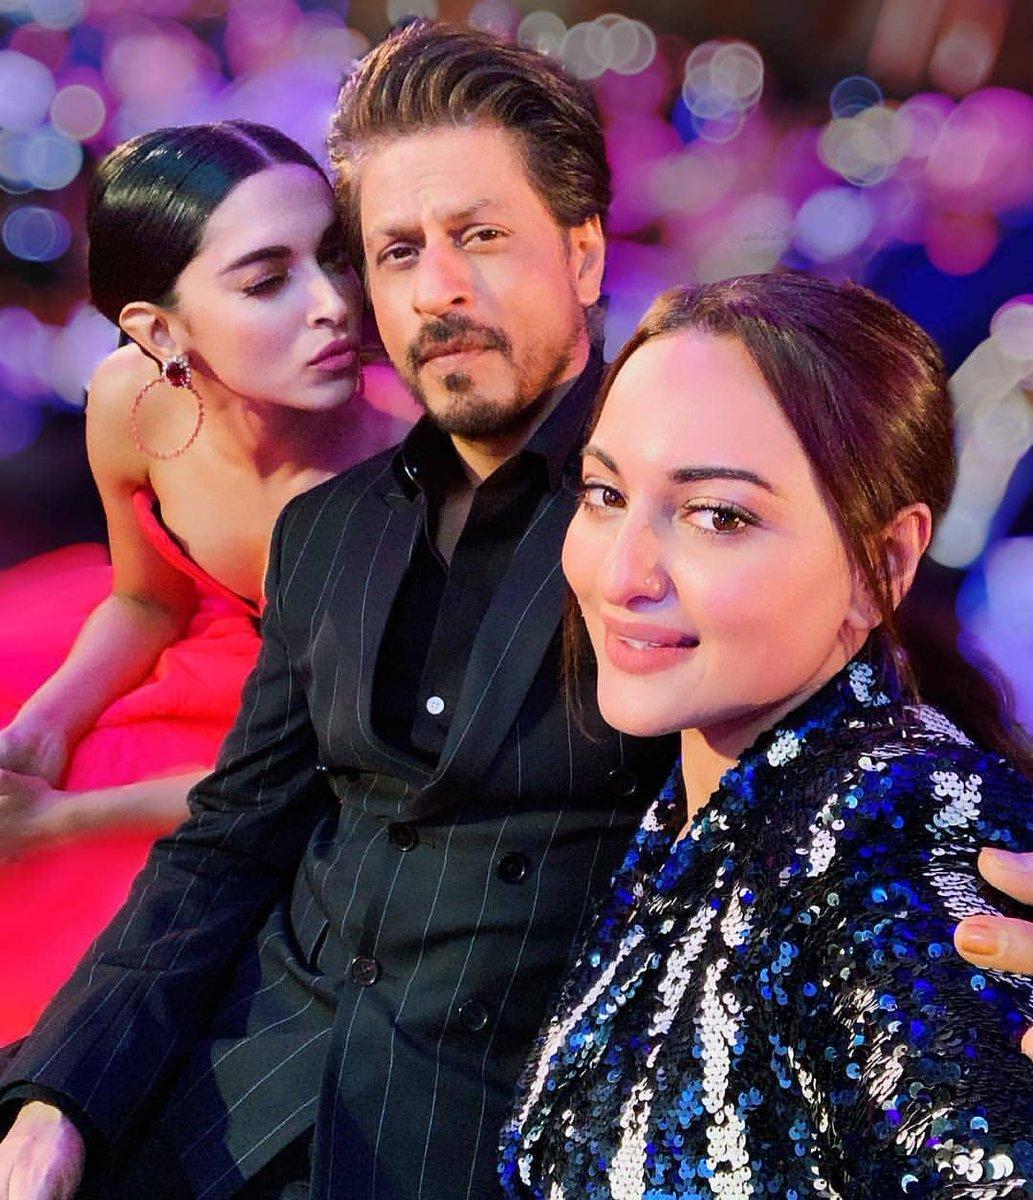 #KingKhan #ShahRukhKhan with #deepikapadukone &amp; #sonakshisinha At #filmfare #FilmfareAwards #FilmfareGlamourAndStyleAwards #GlamourAndStyleAwards<br>http://pic.twitter.com/pEGNFKzSlo